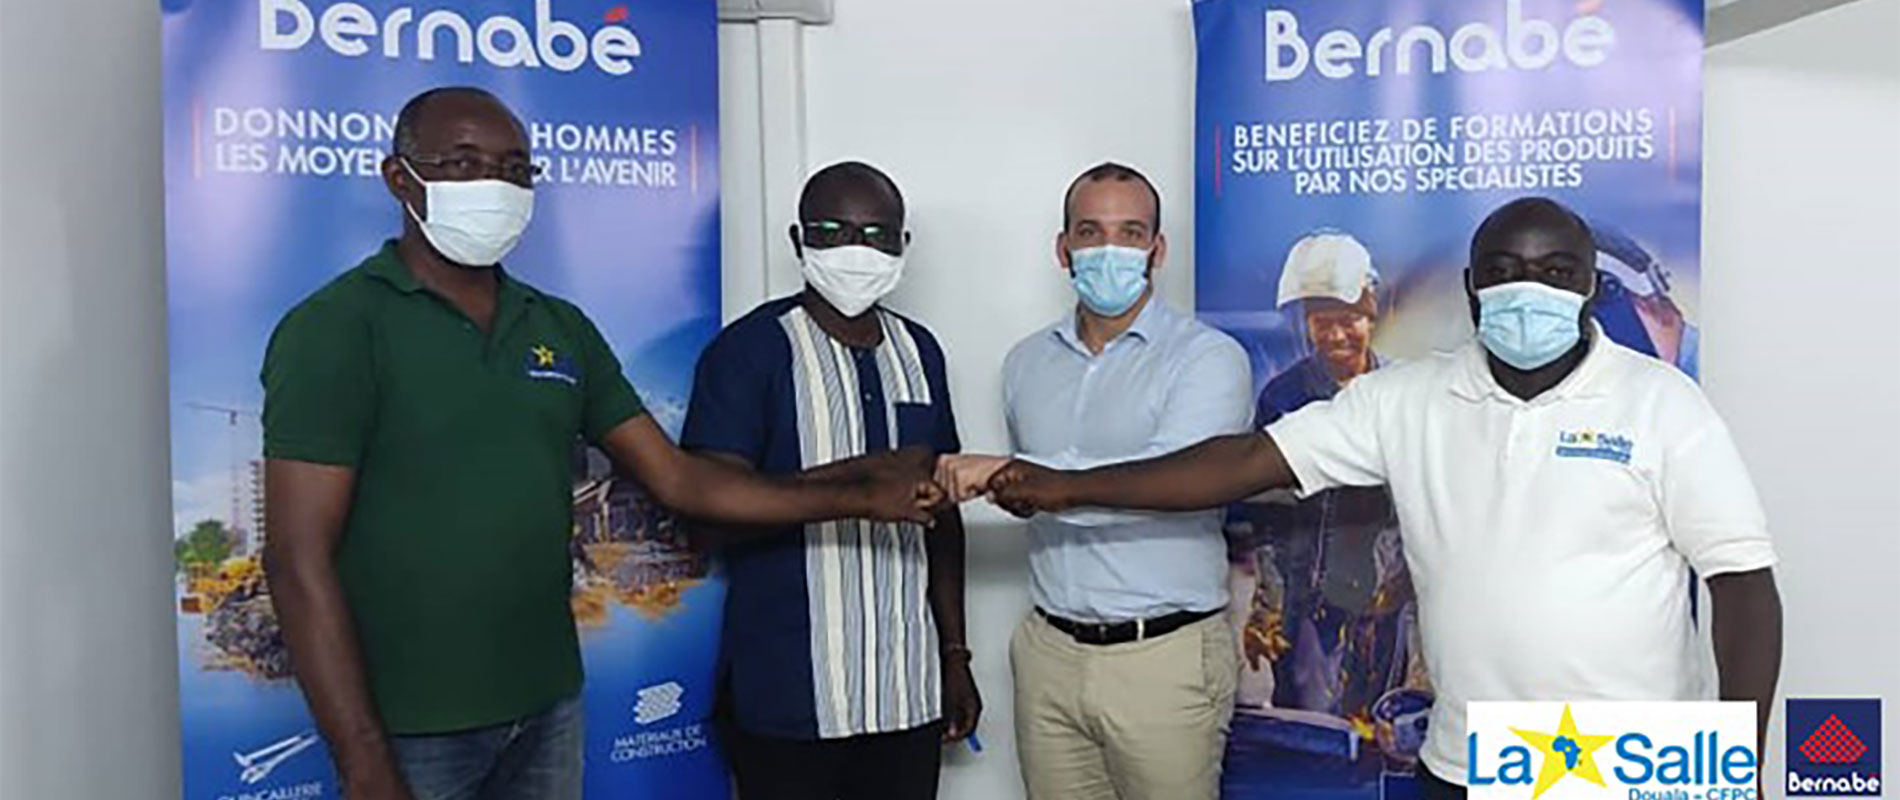 Signature de Partenariat entre Bernabé Cameroun et le Complexe La Salle Douala